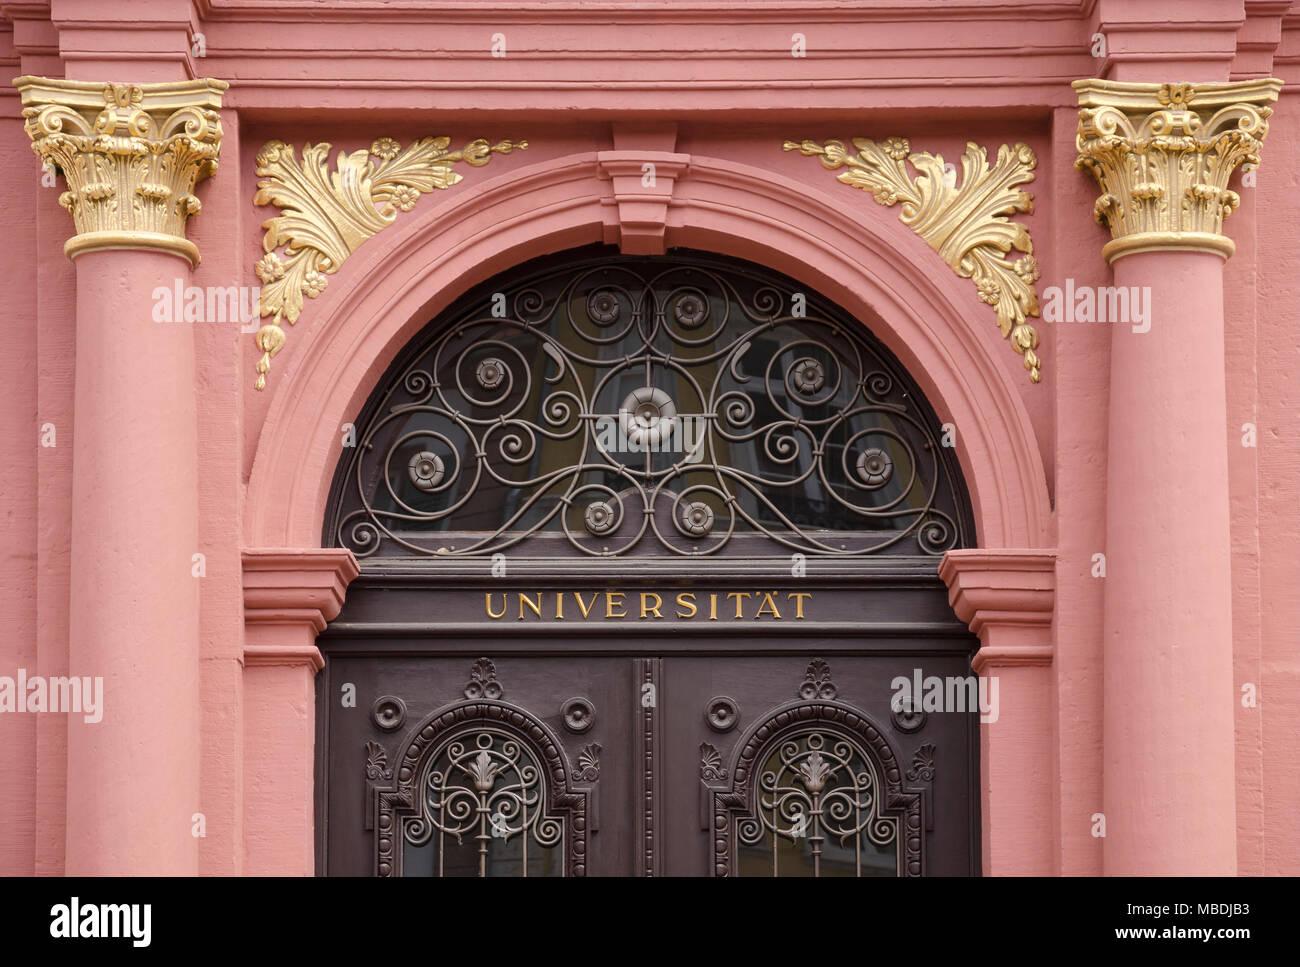 Universität, Heidelberg, Baden-Württemberg, Deutschland, Europa - Stock Image